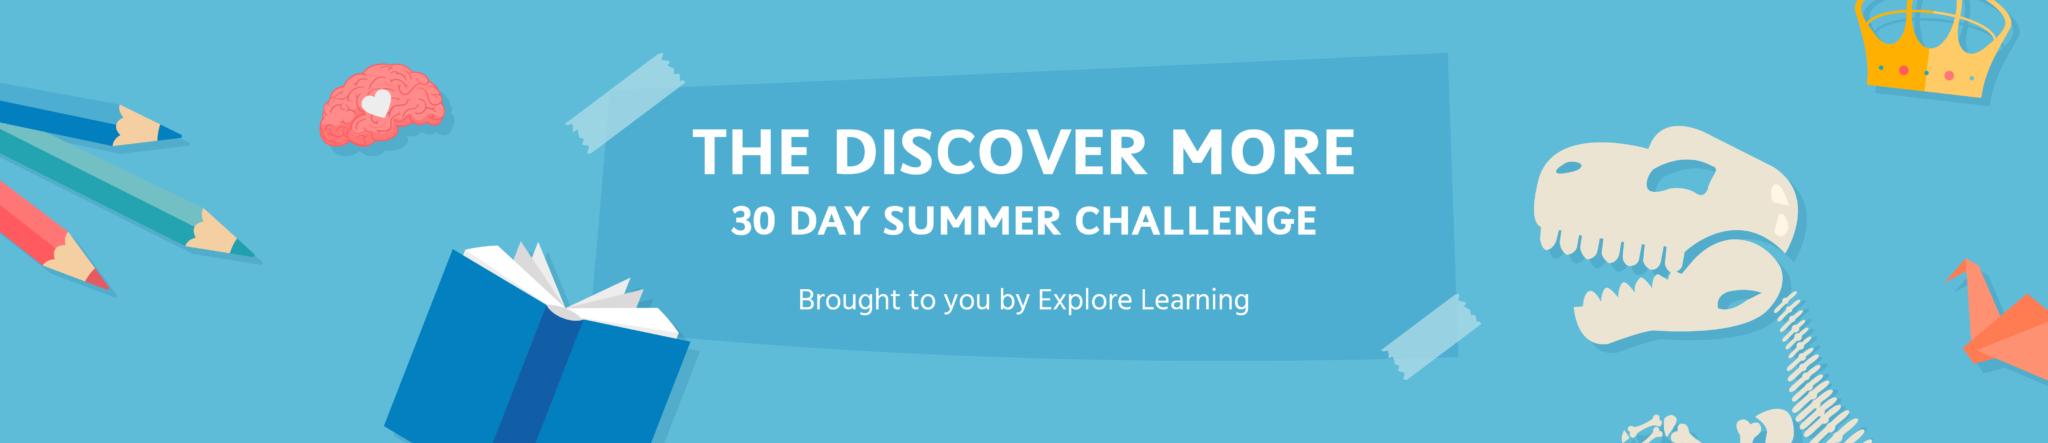 Discover more summer challenge banner